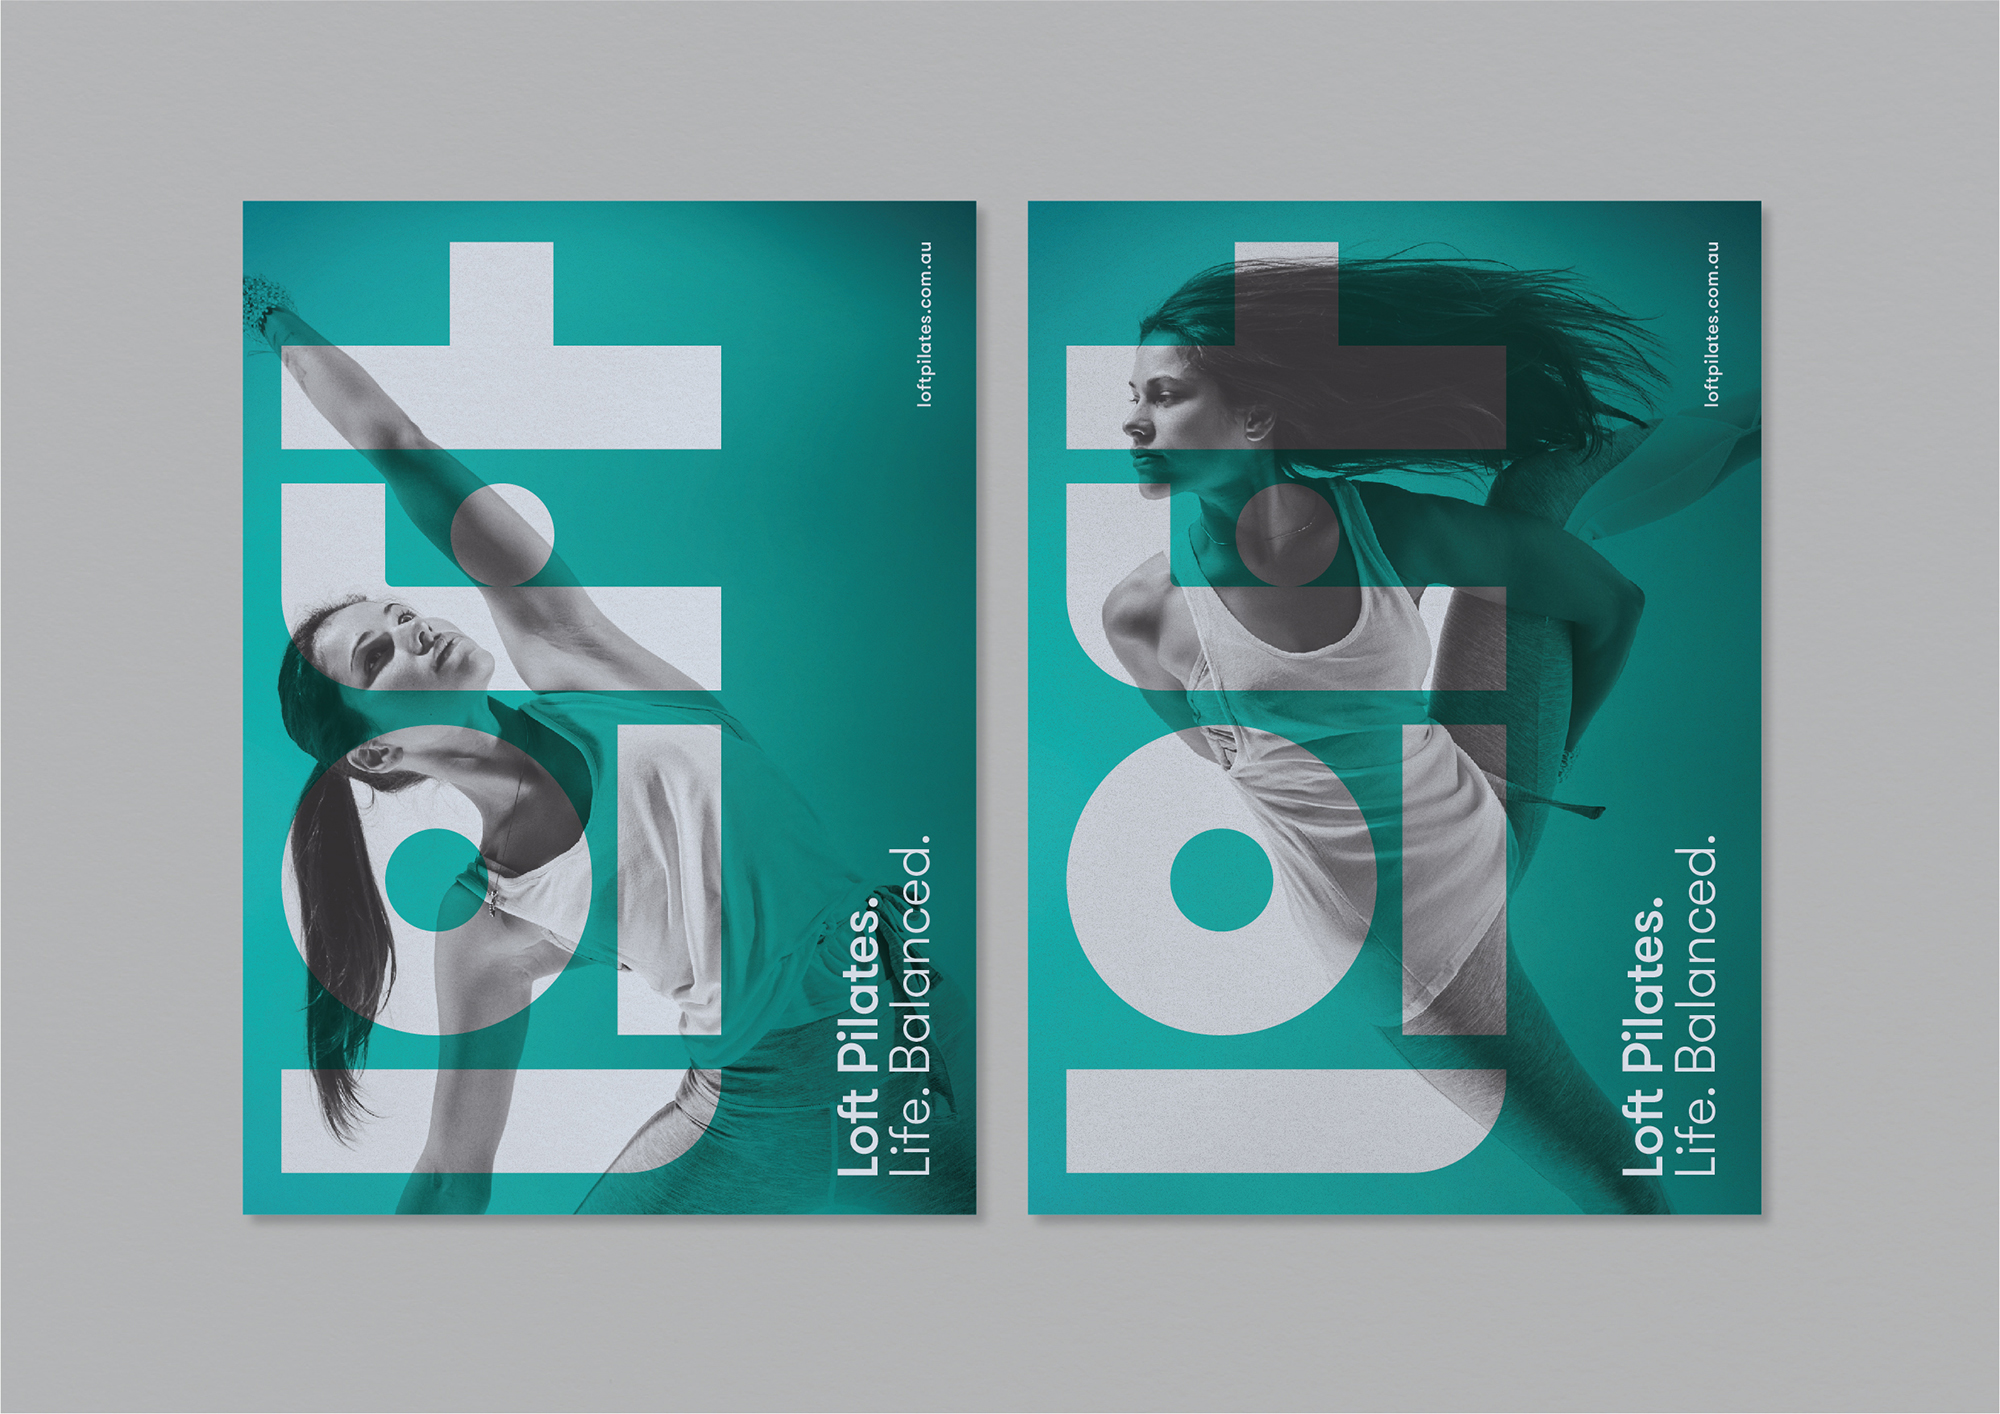 Loft Pilates –  Positioning and full-brand identity for this ambitious Australian Pilates Studio